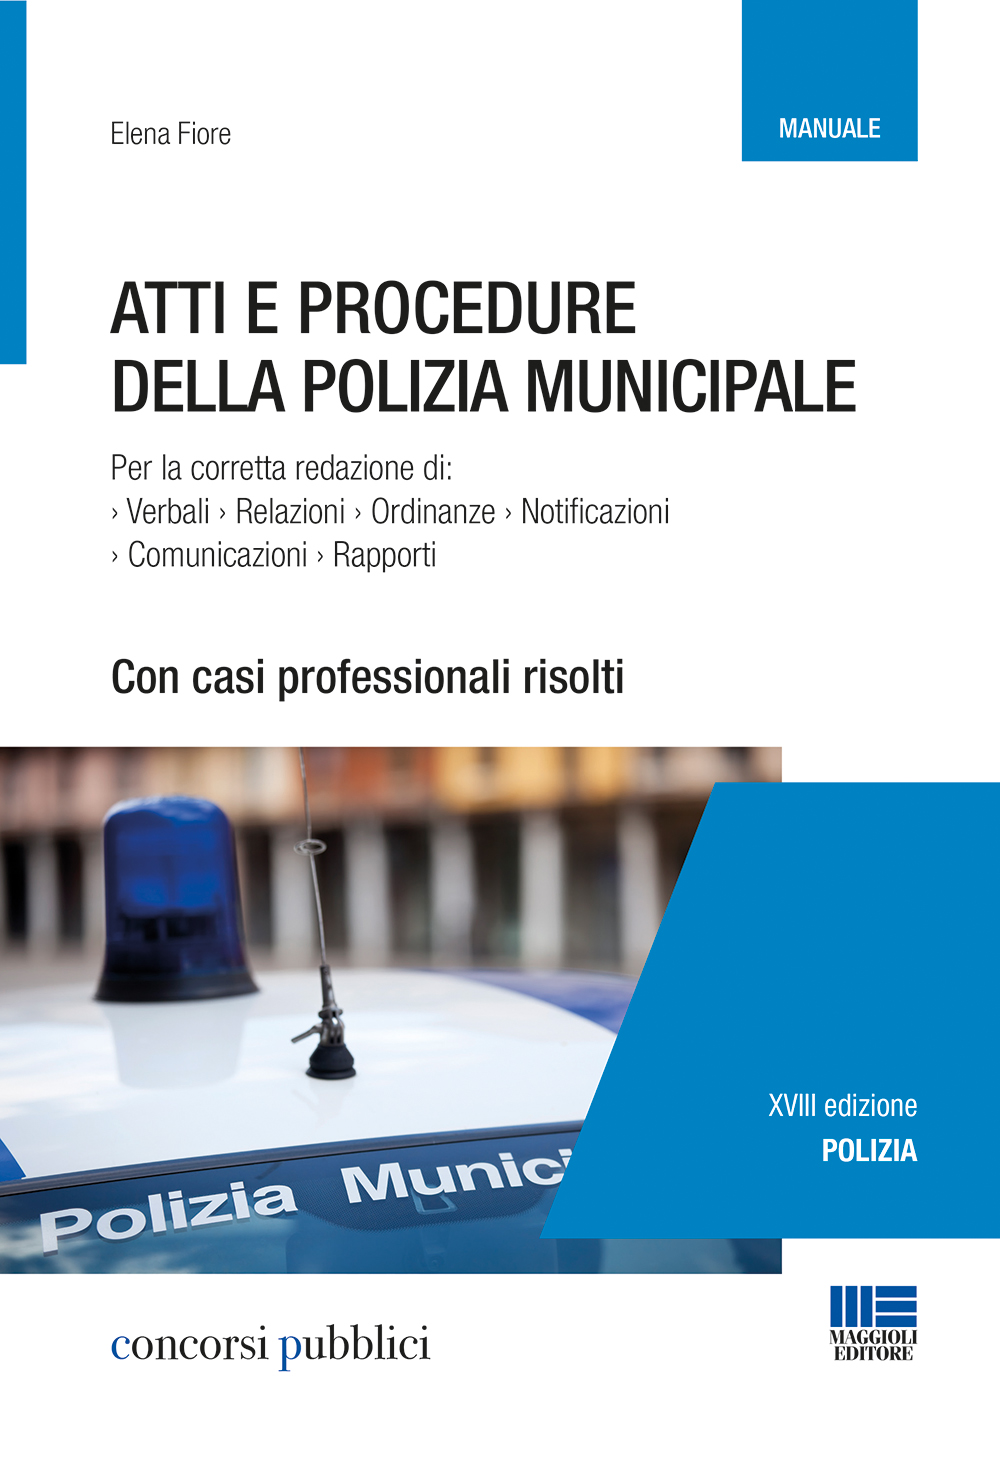 Terziario e Servizi - Multiservizi - Cooperative (Ugl ...